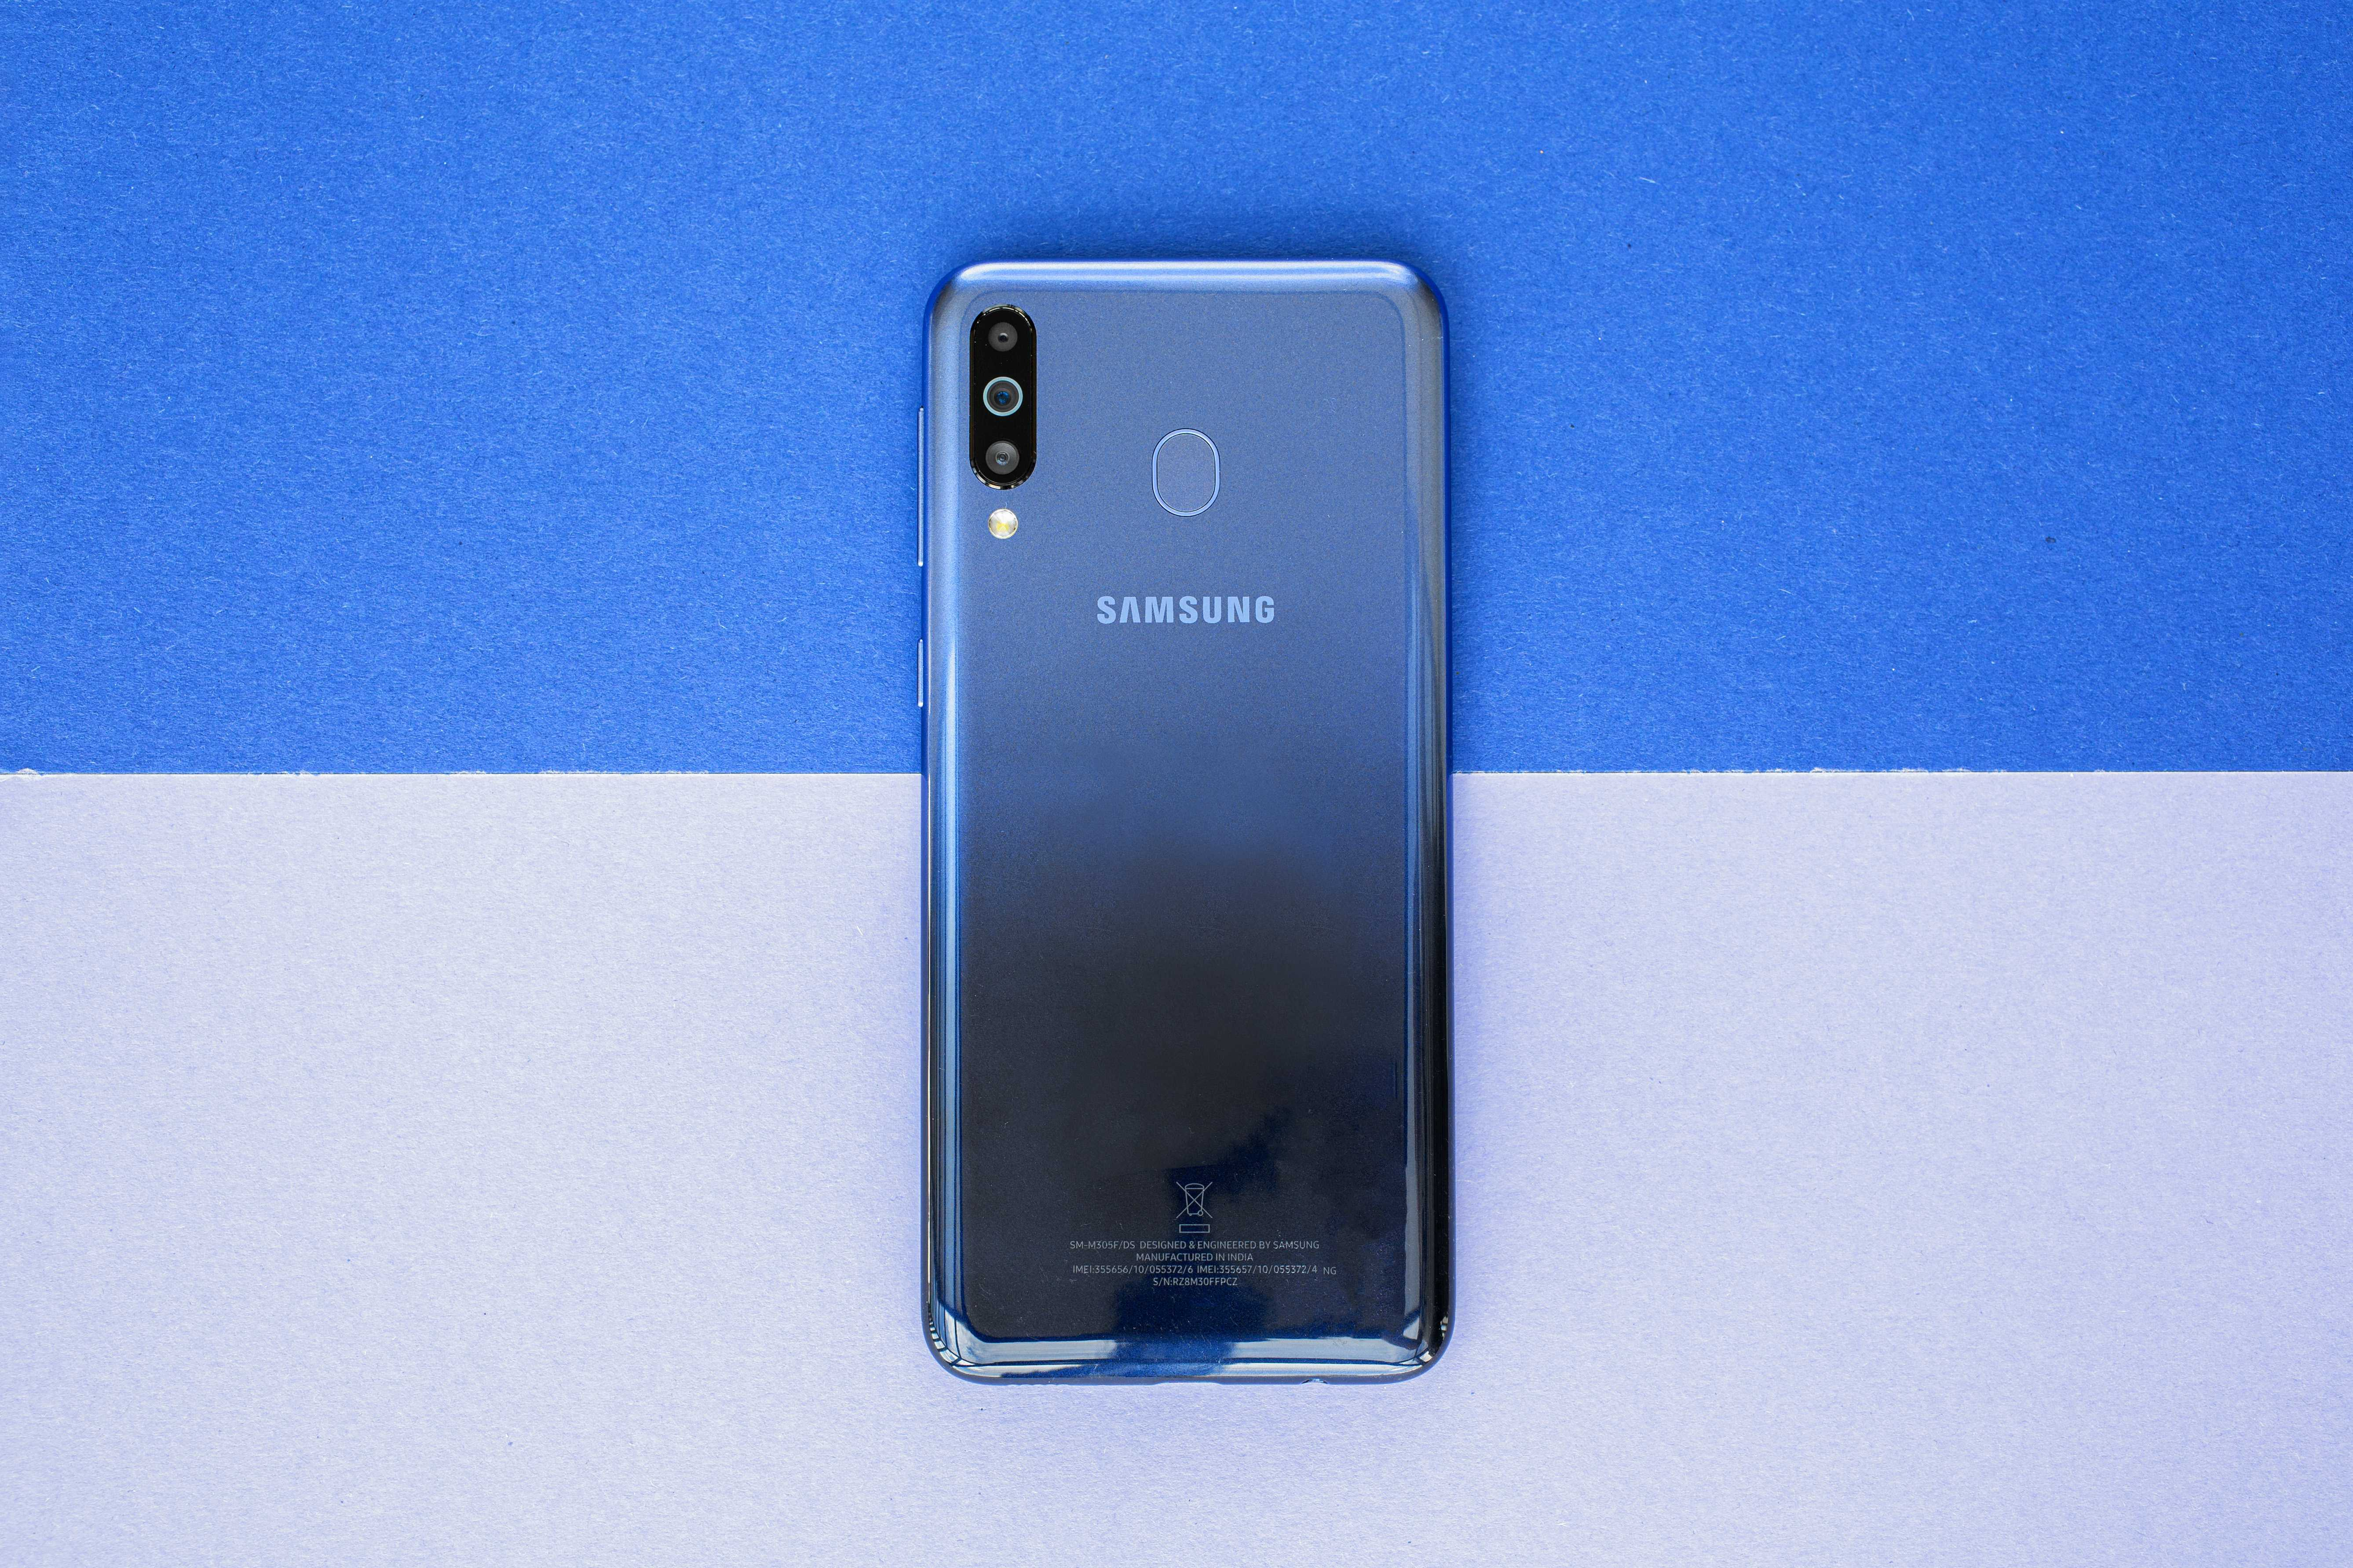 Samsung galaxy m21s: дата выхода, обзор, технические характеристики, цена, отзывы, фото